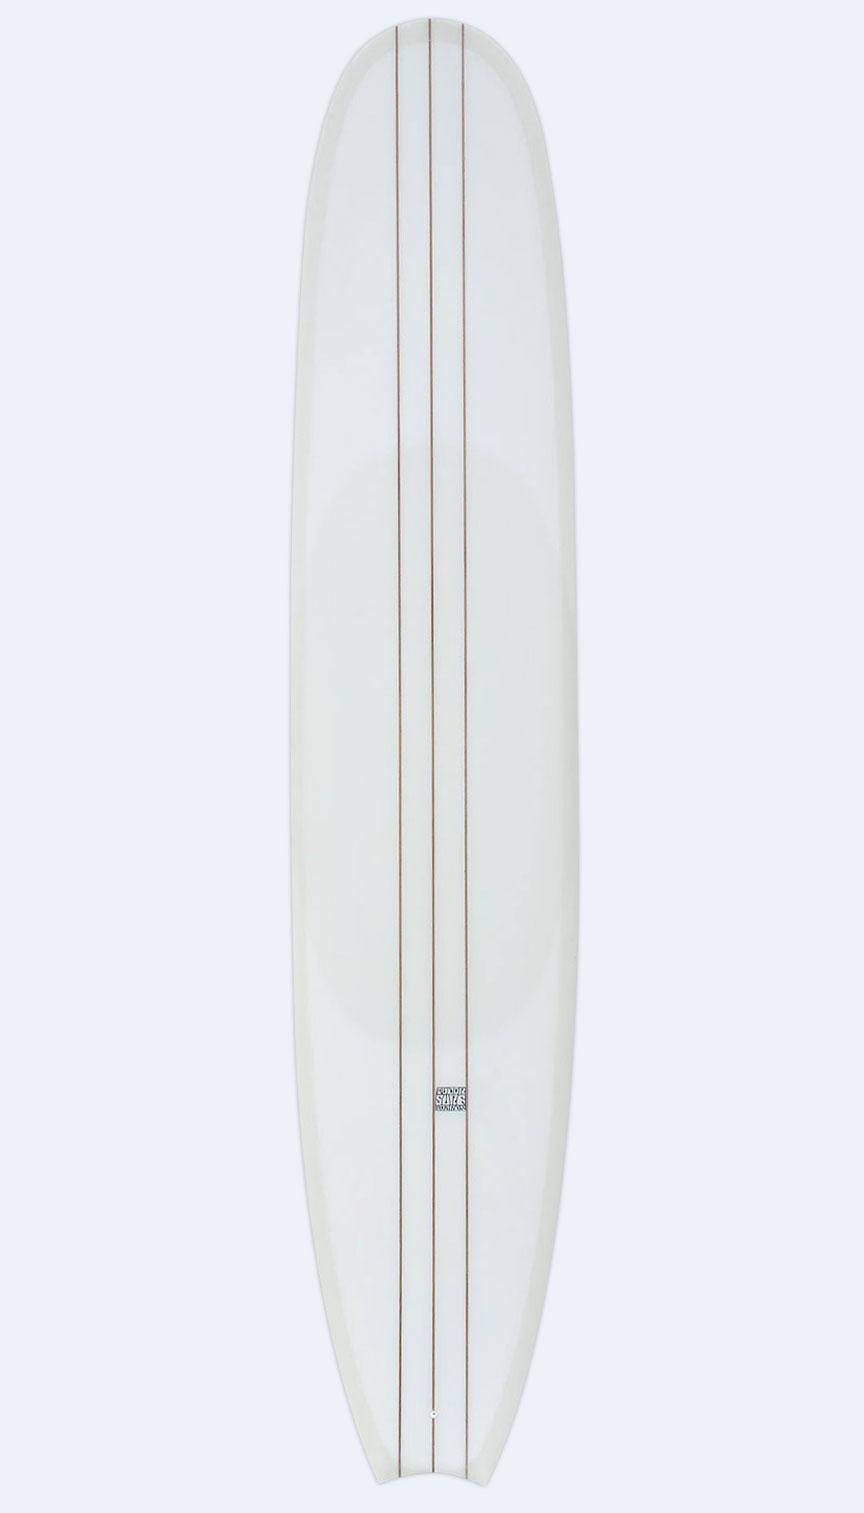 tudor-surfboards-crescent